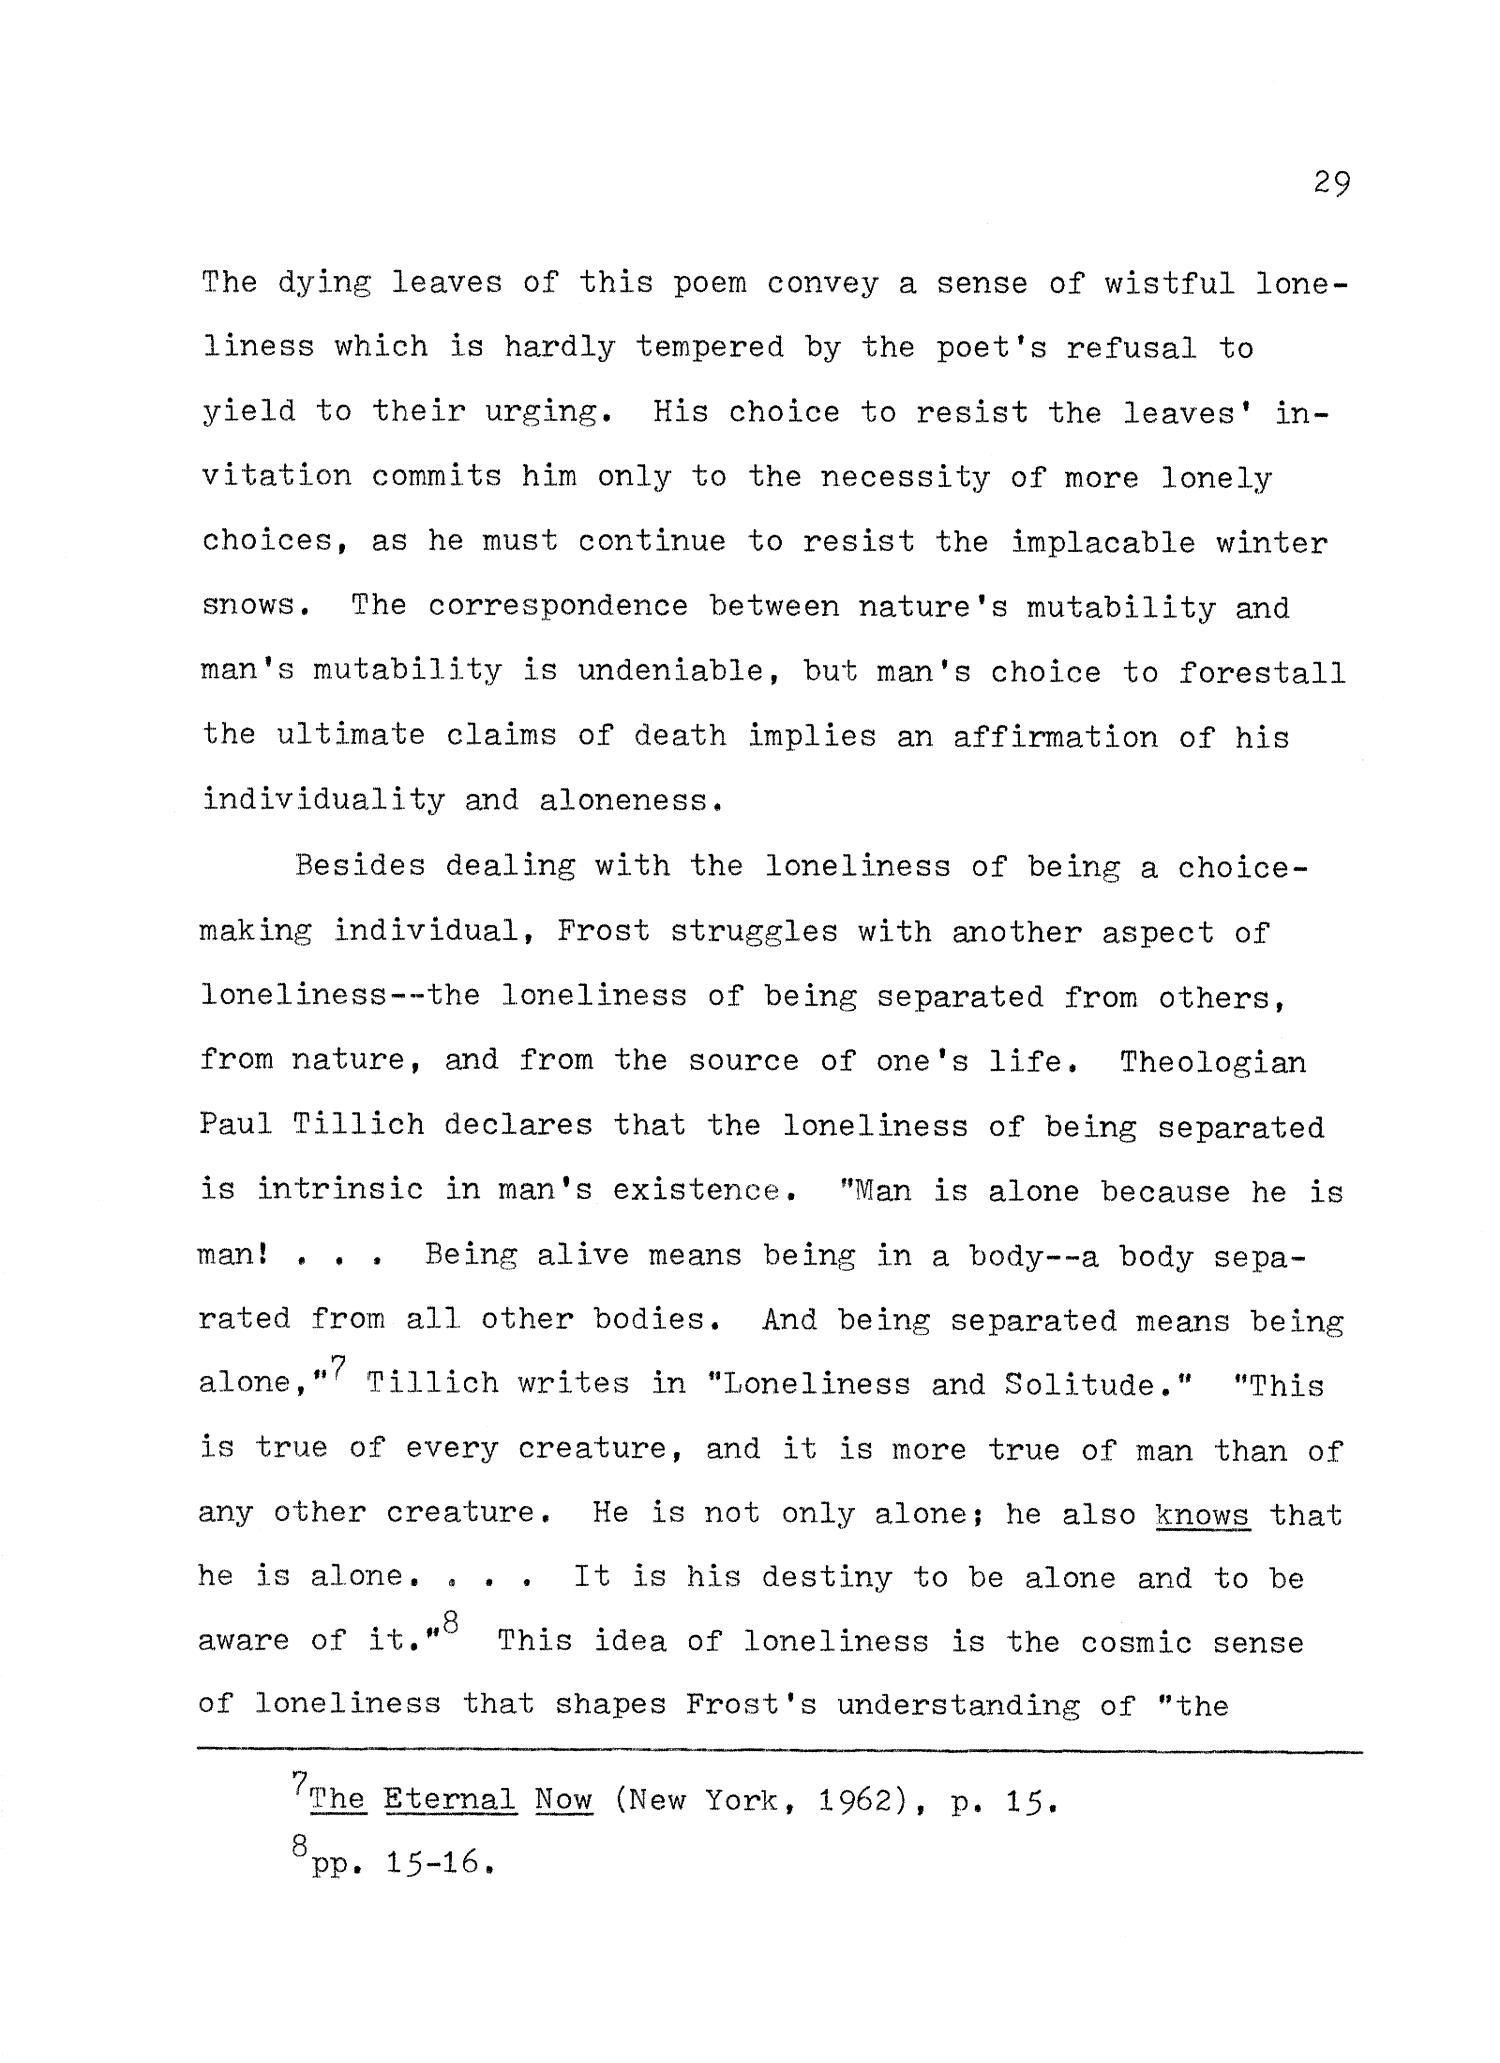 Ross 2009 essays